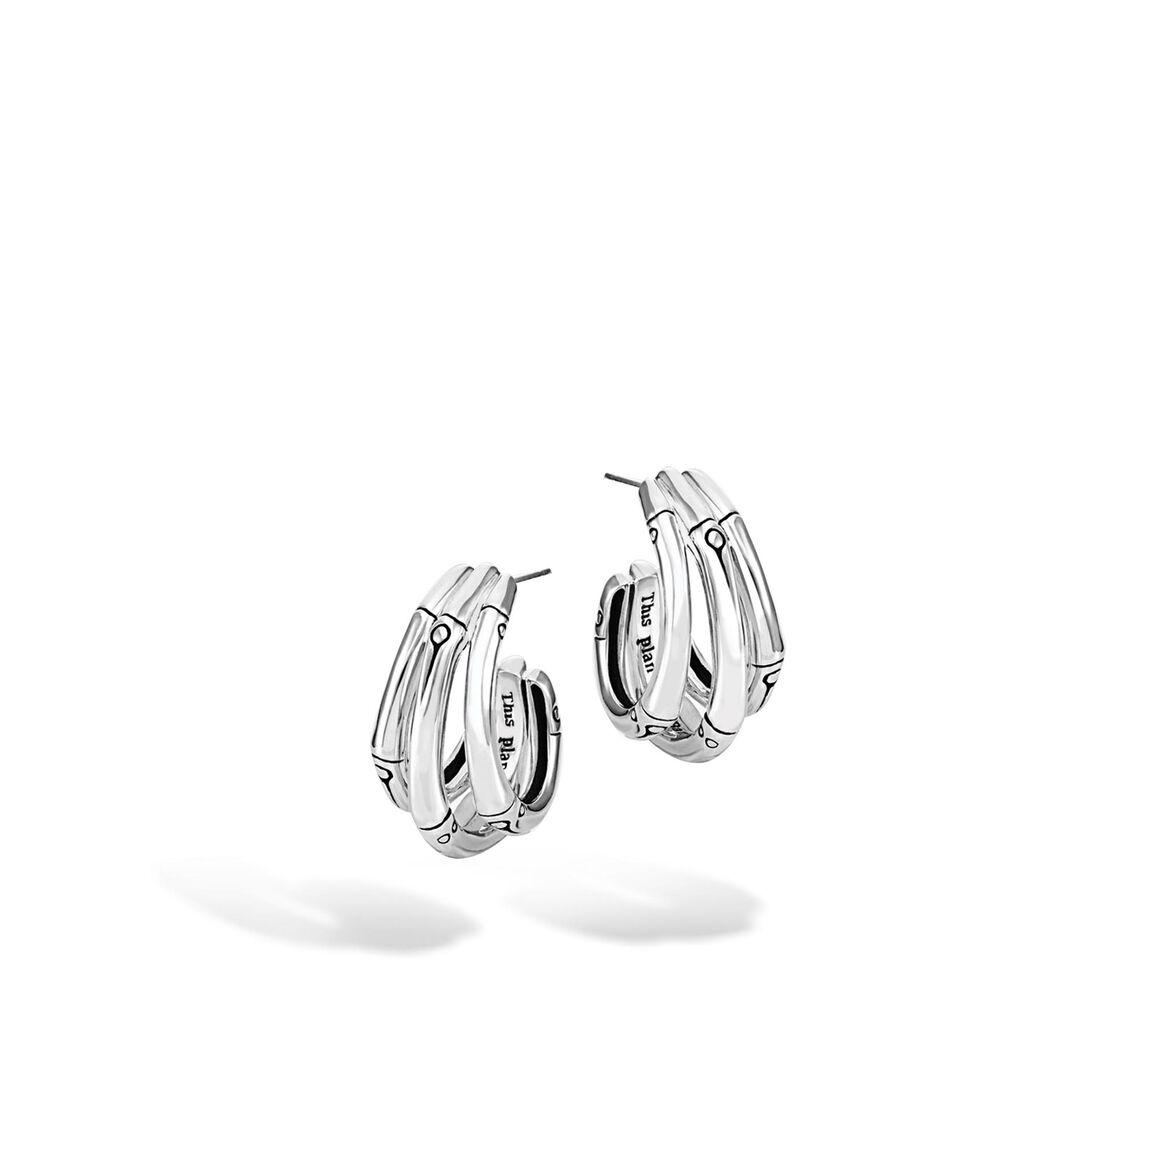 Bamboo Small J Hoop Earring in Silver